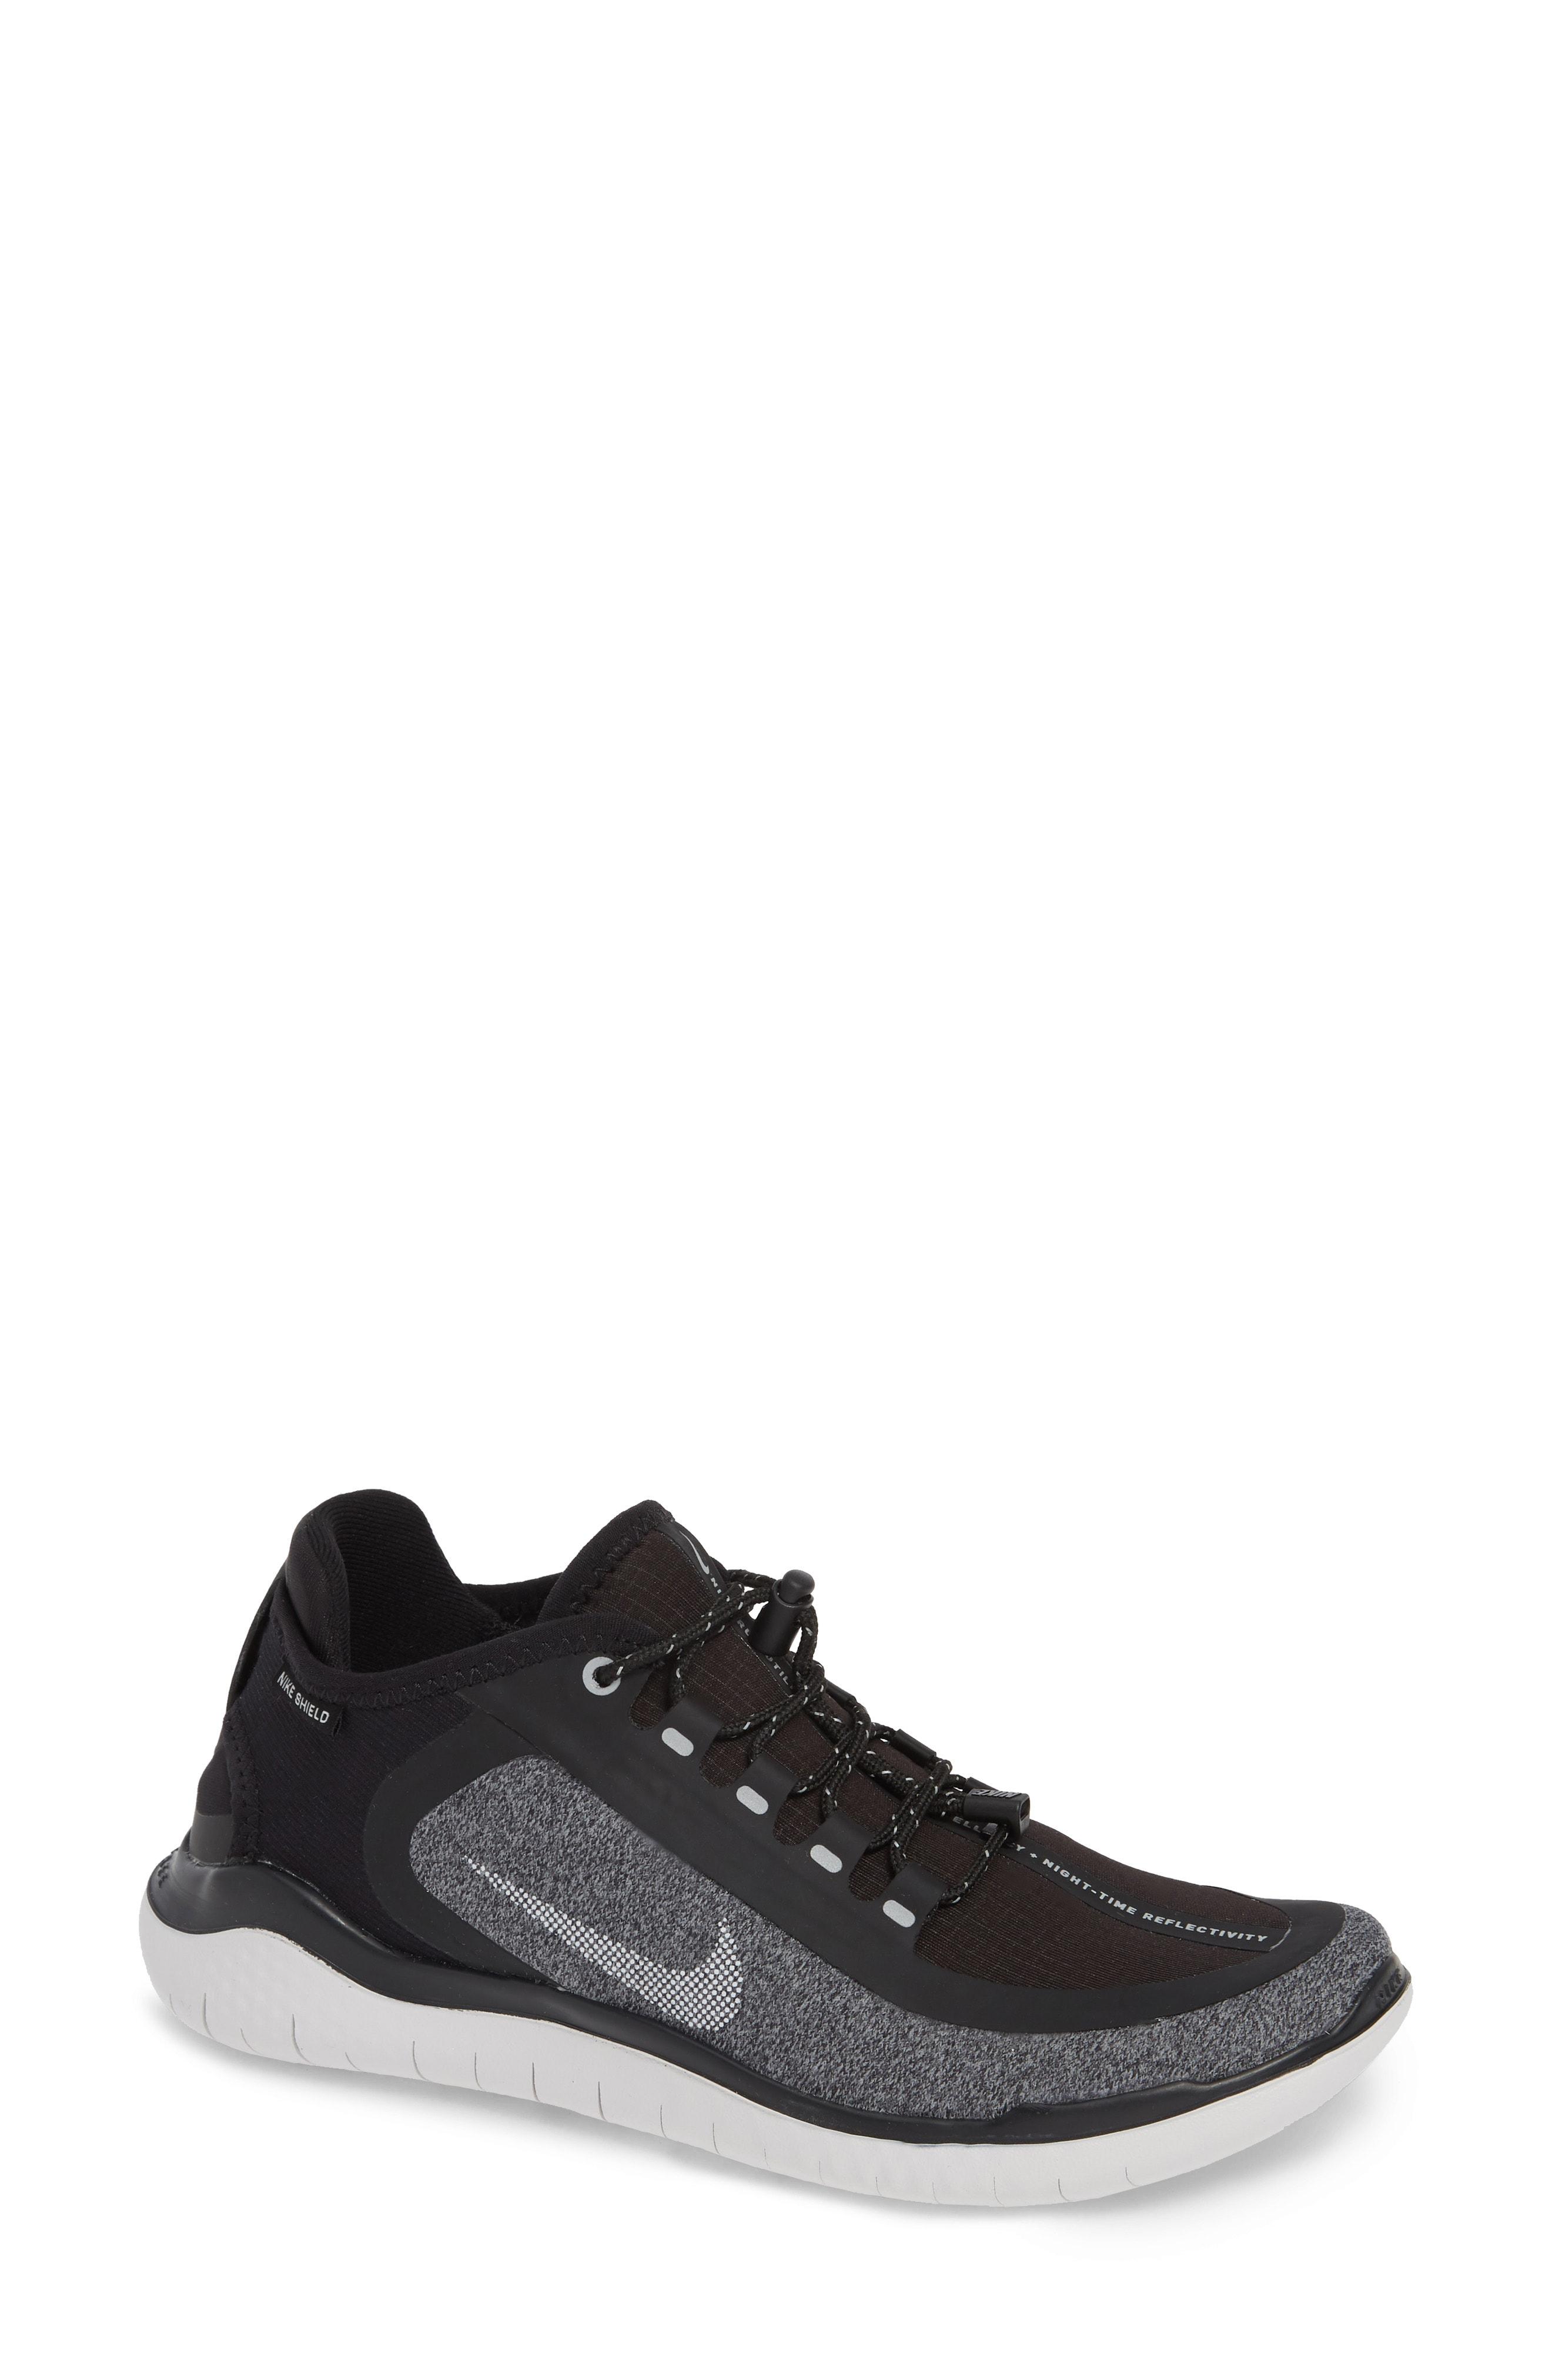 Nike Free RN 2018 Shield Water Repellent Running Shoe (Women)